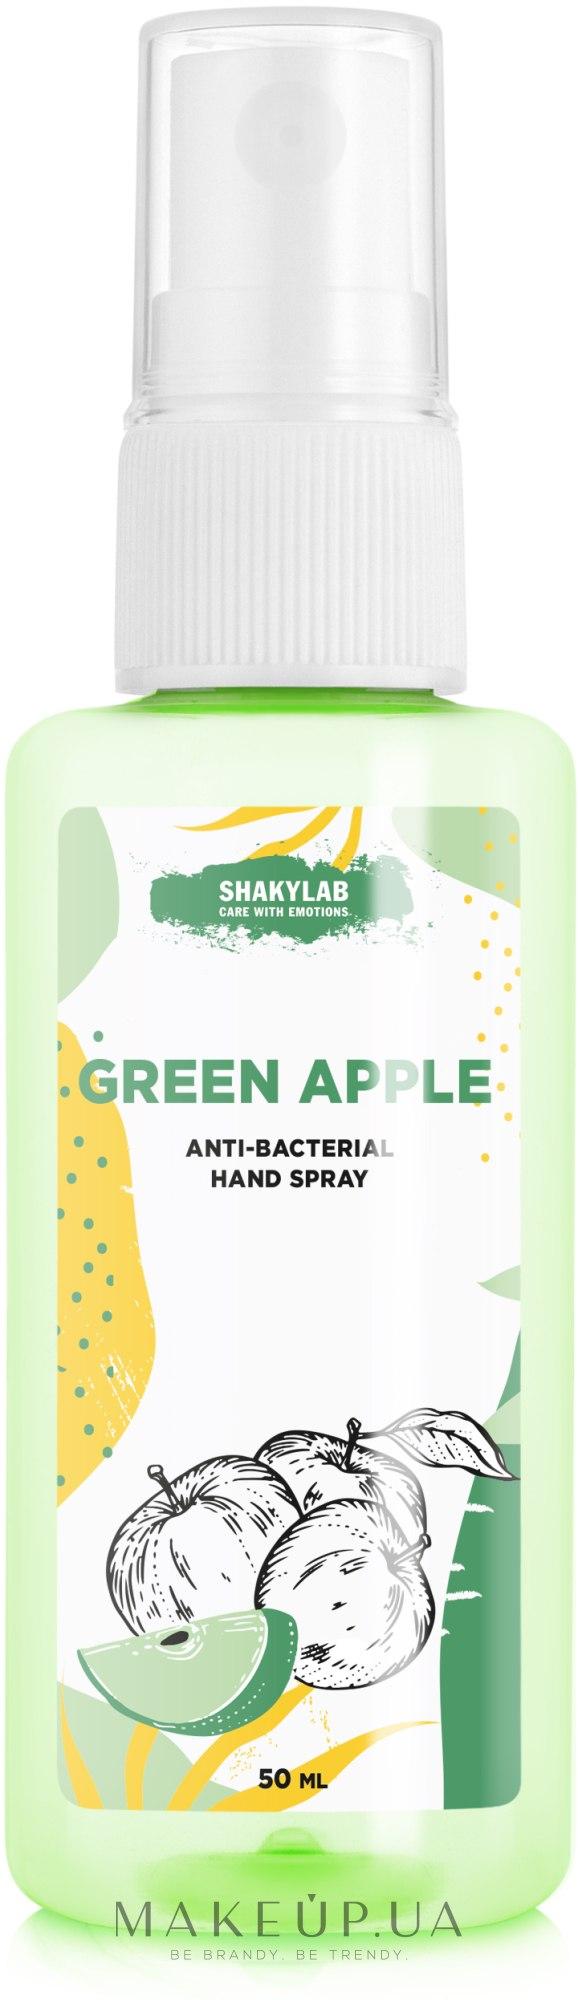 "Антибактериальный спрей для рук ""Green apple"" - SHAKYLAB Anti-Bacterial Hand Spray — фото 50ml"